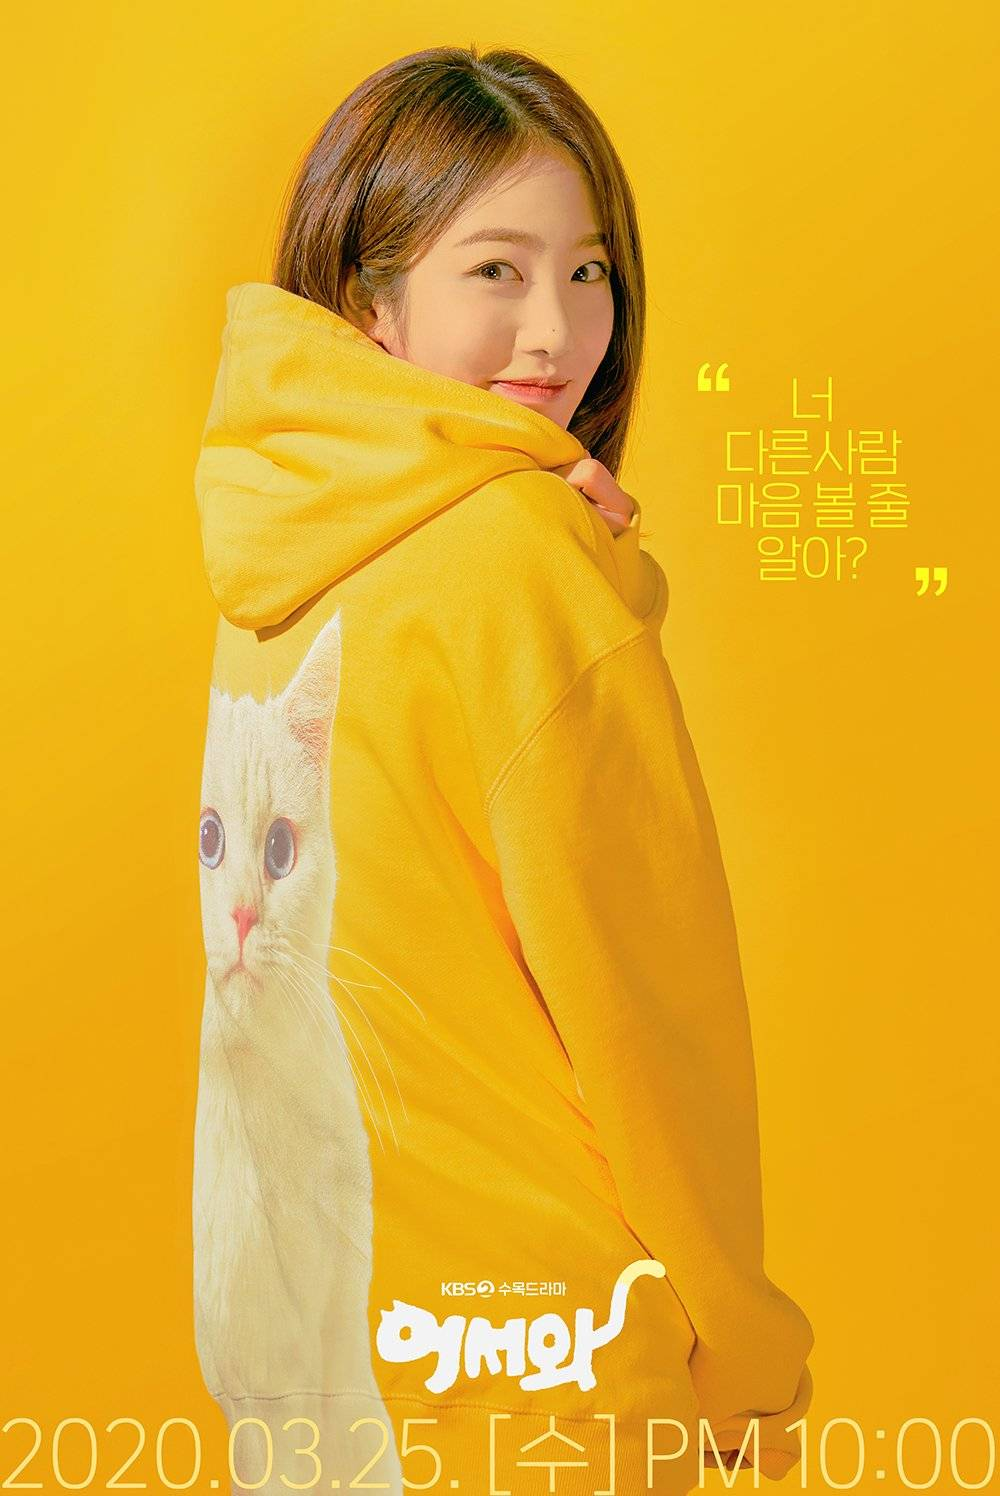 Meow The Secret Bot : secret, Photo], Poster, Added, Upcoming, Korean, Drama,